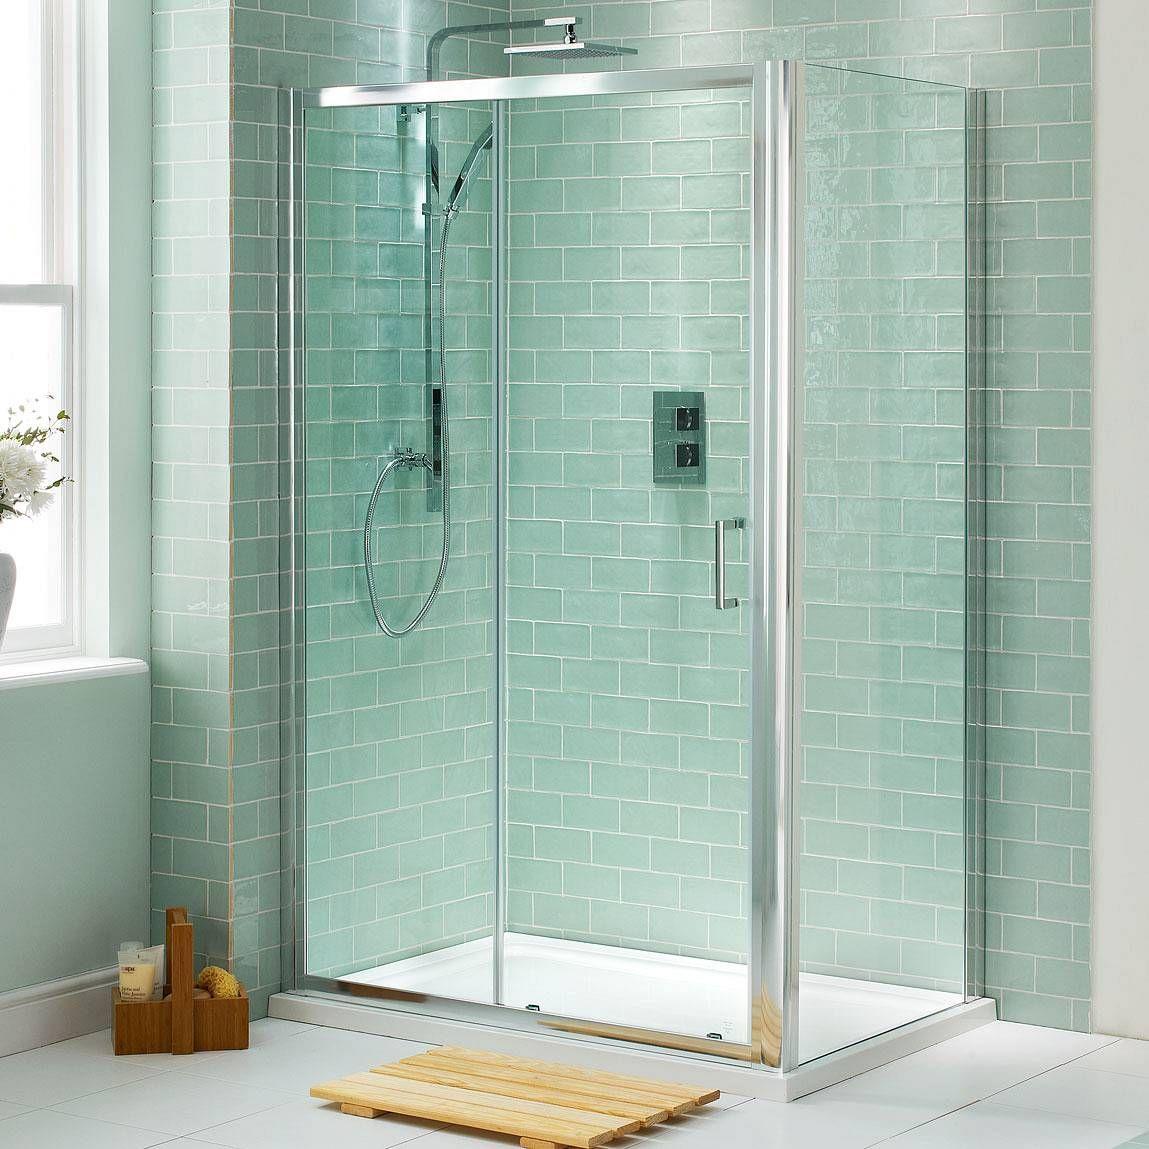 Excellent shower enclosures denver | ThePlanMagazine.com ...